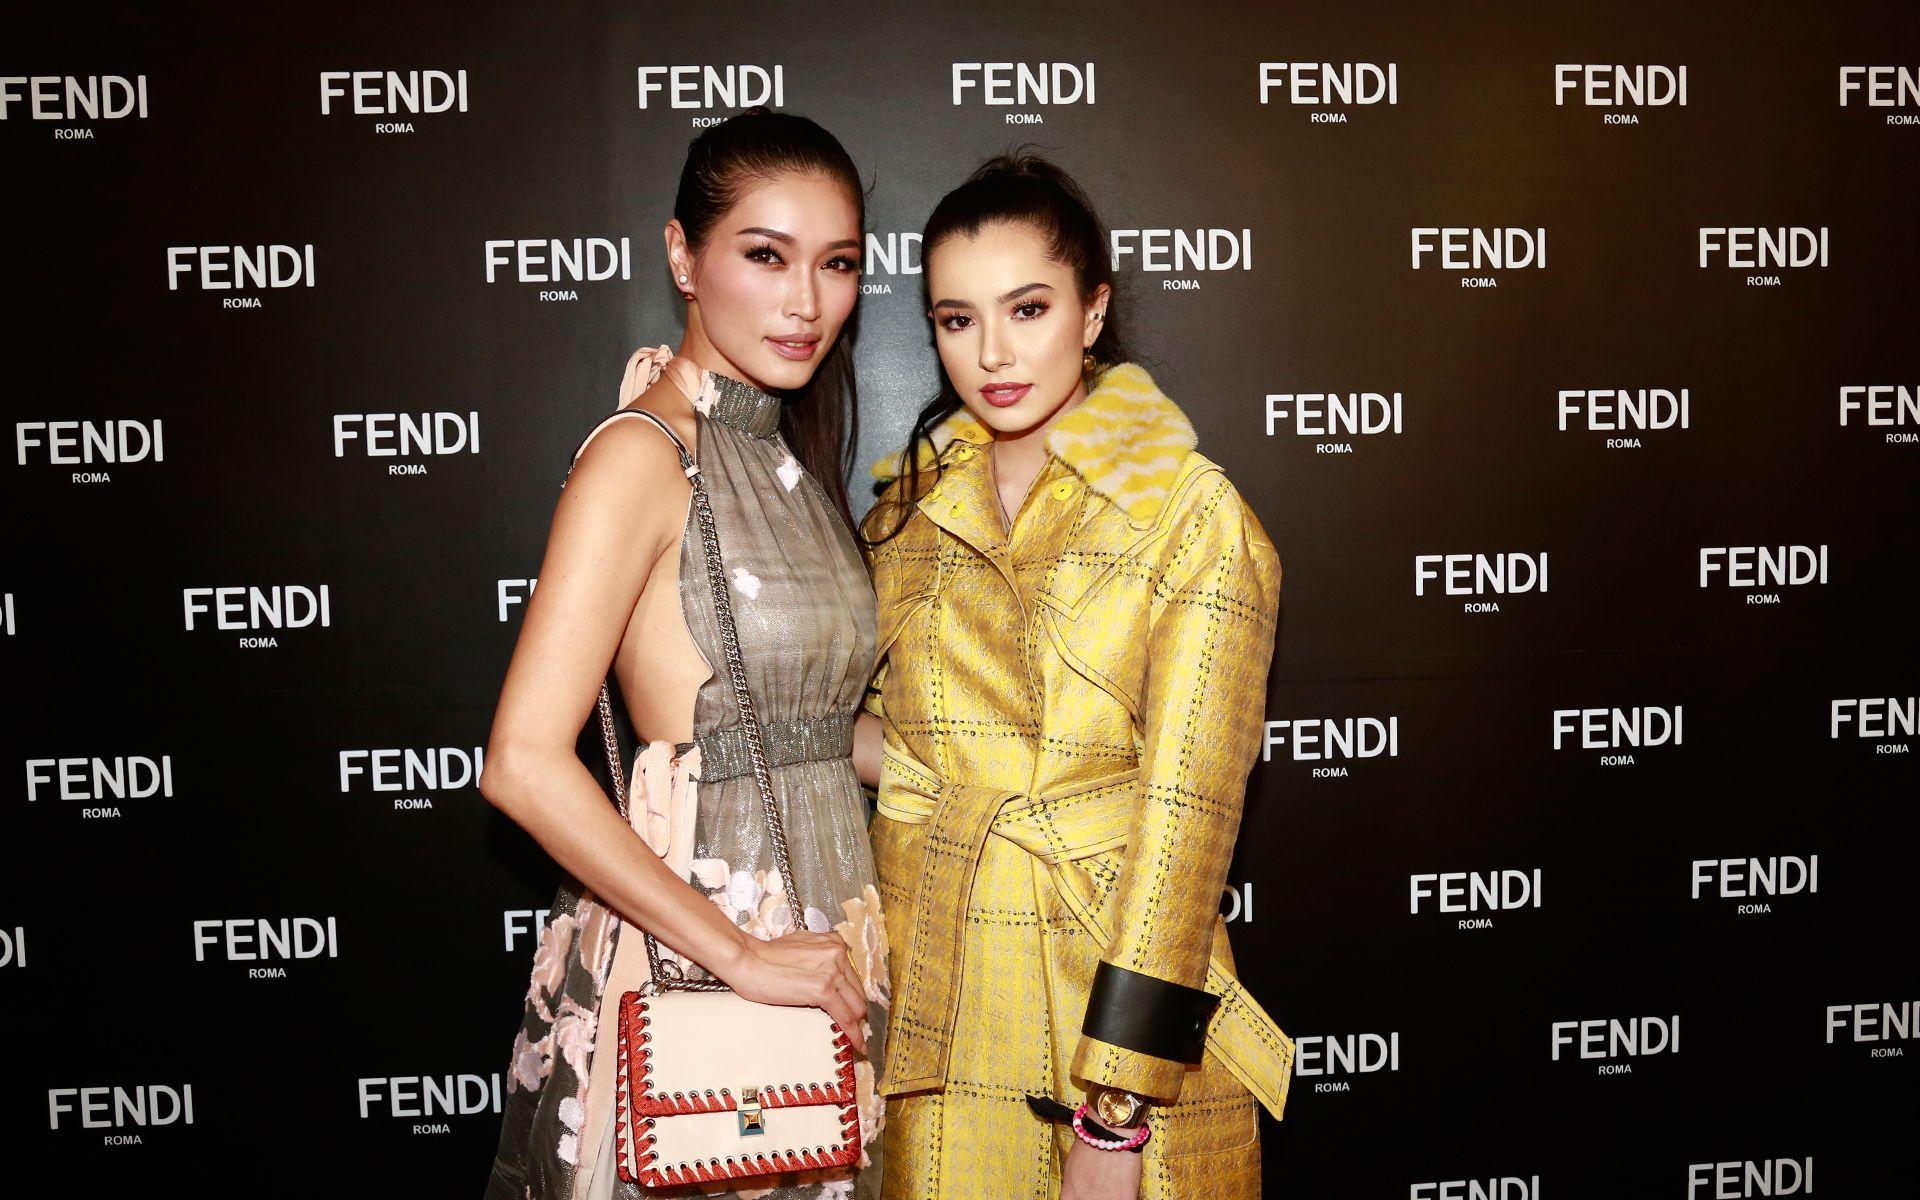 Amber Chia and Amelia Henderson